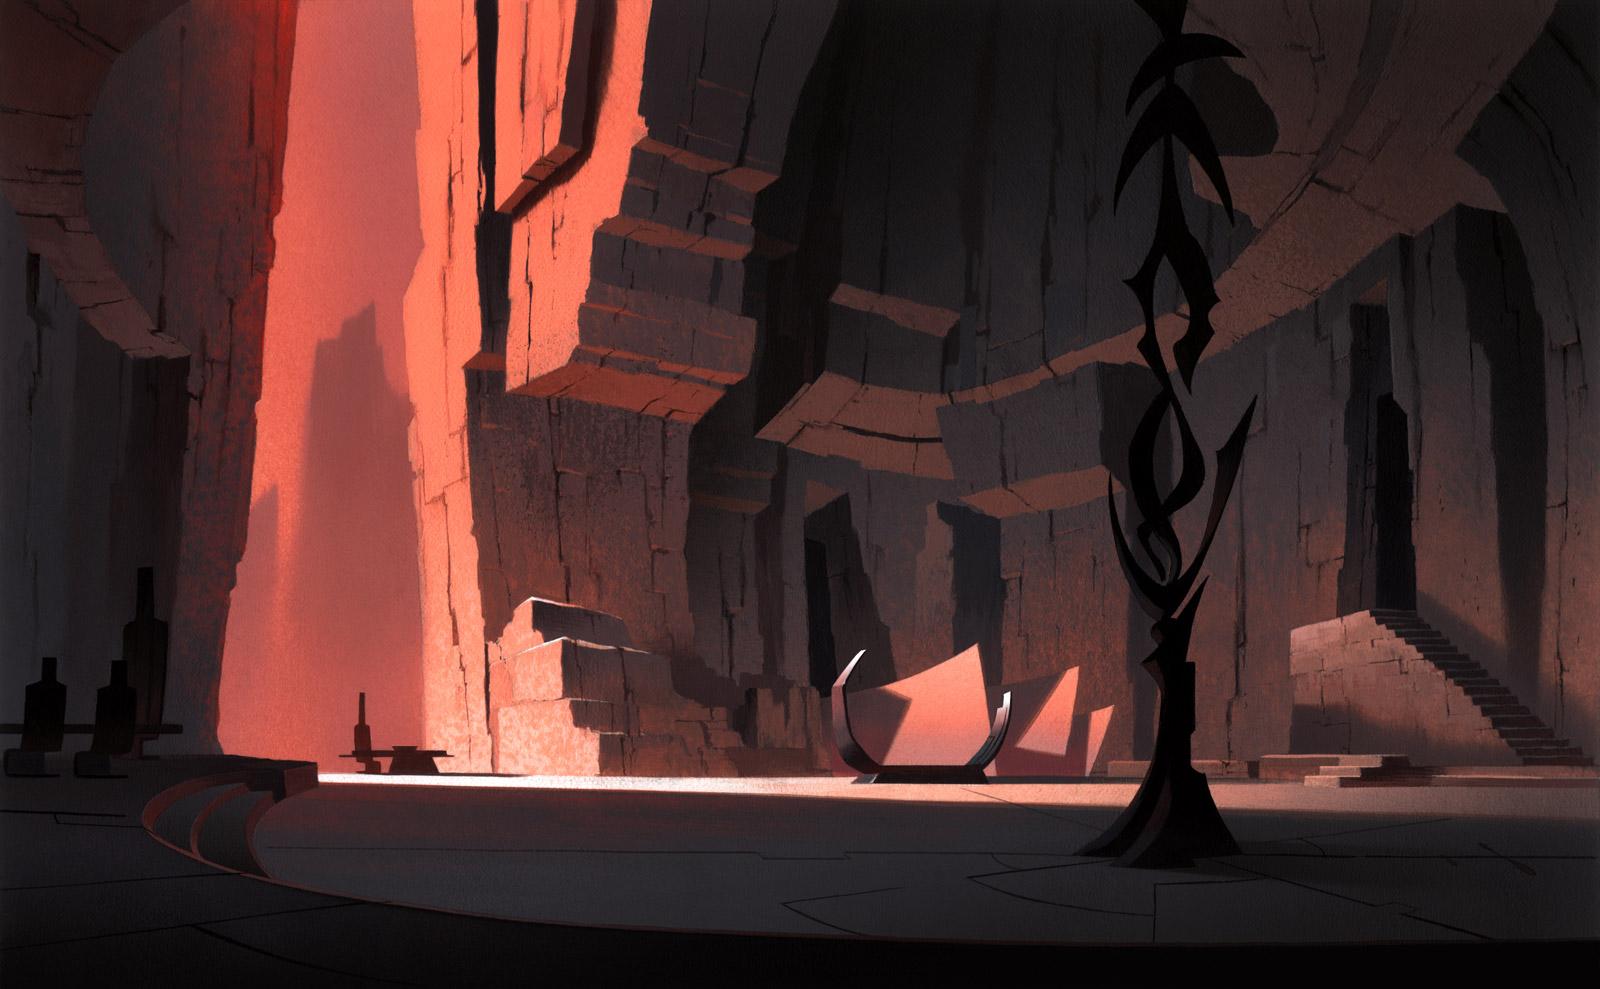 Background Painter: Scott Wills